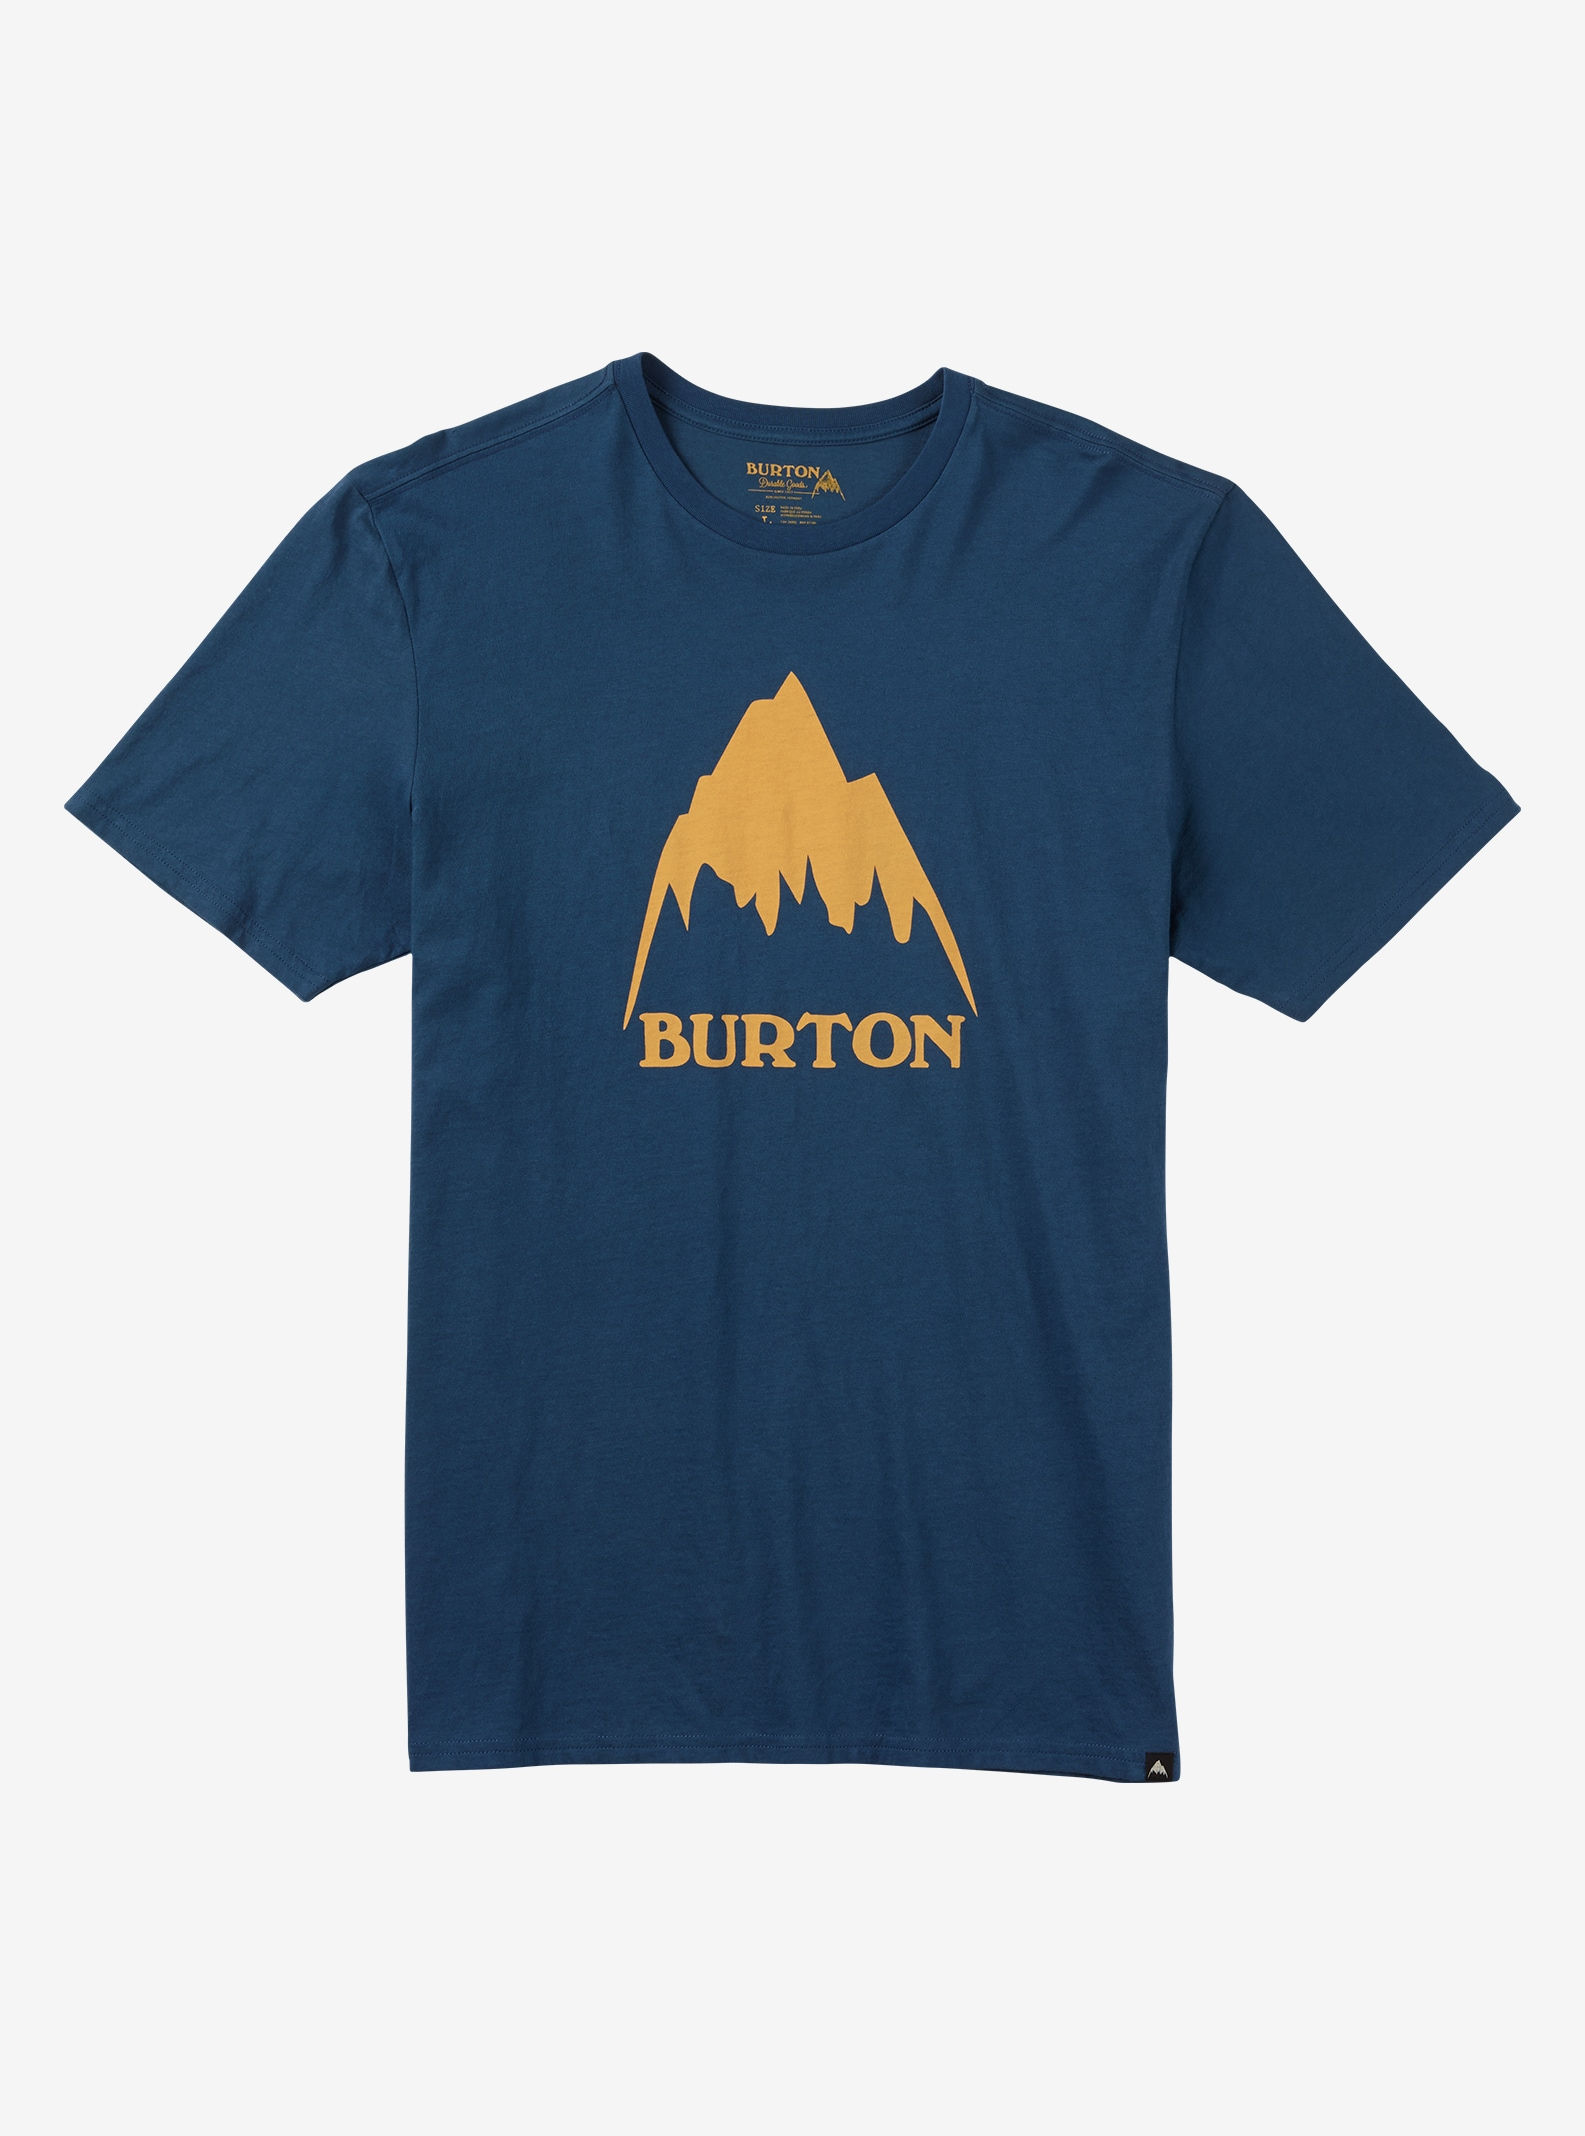 Burton Classic Mountain Short Sleeve T Shirt shown in Indigo